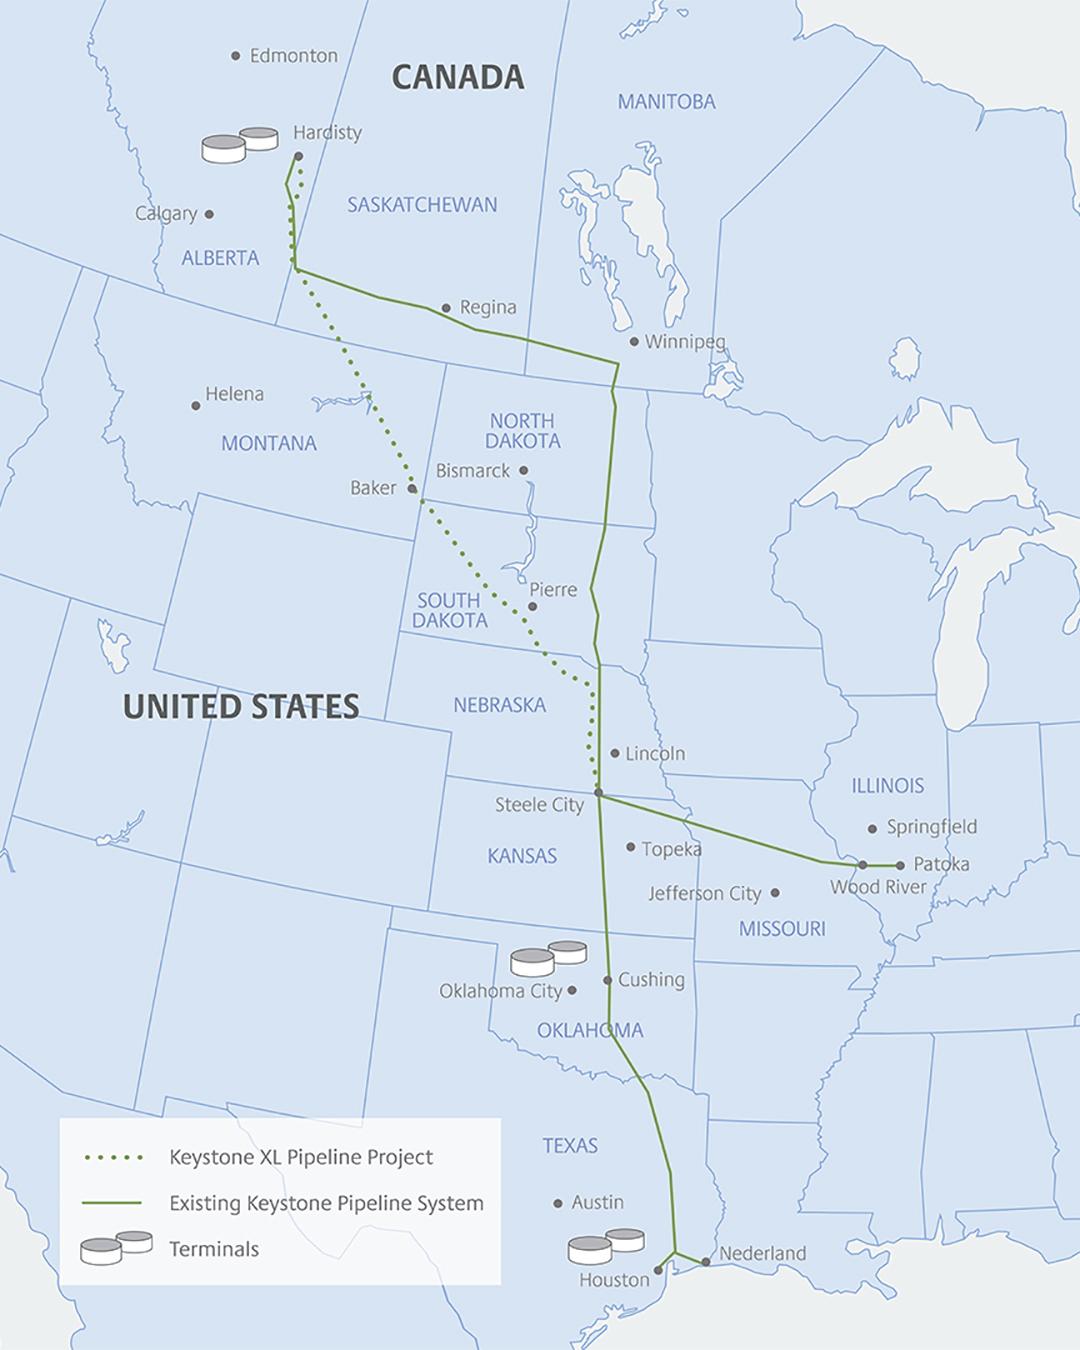 نقشه پروژه خط لوله Keystone XL (منبع: keystonexl.com)